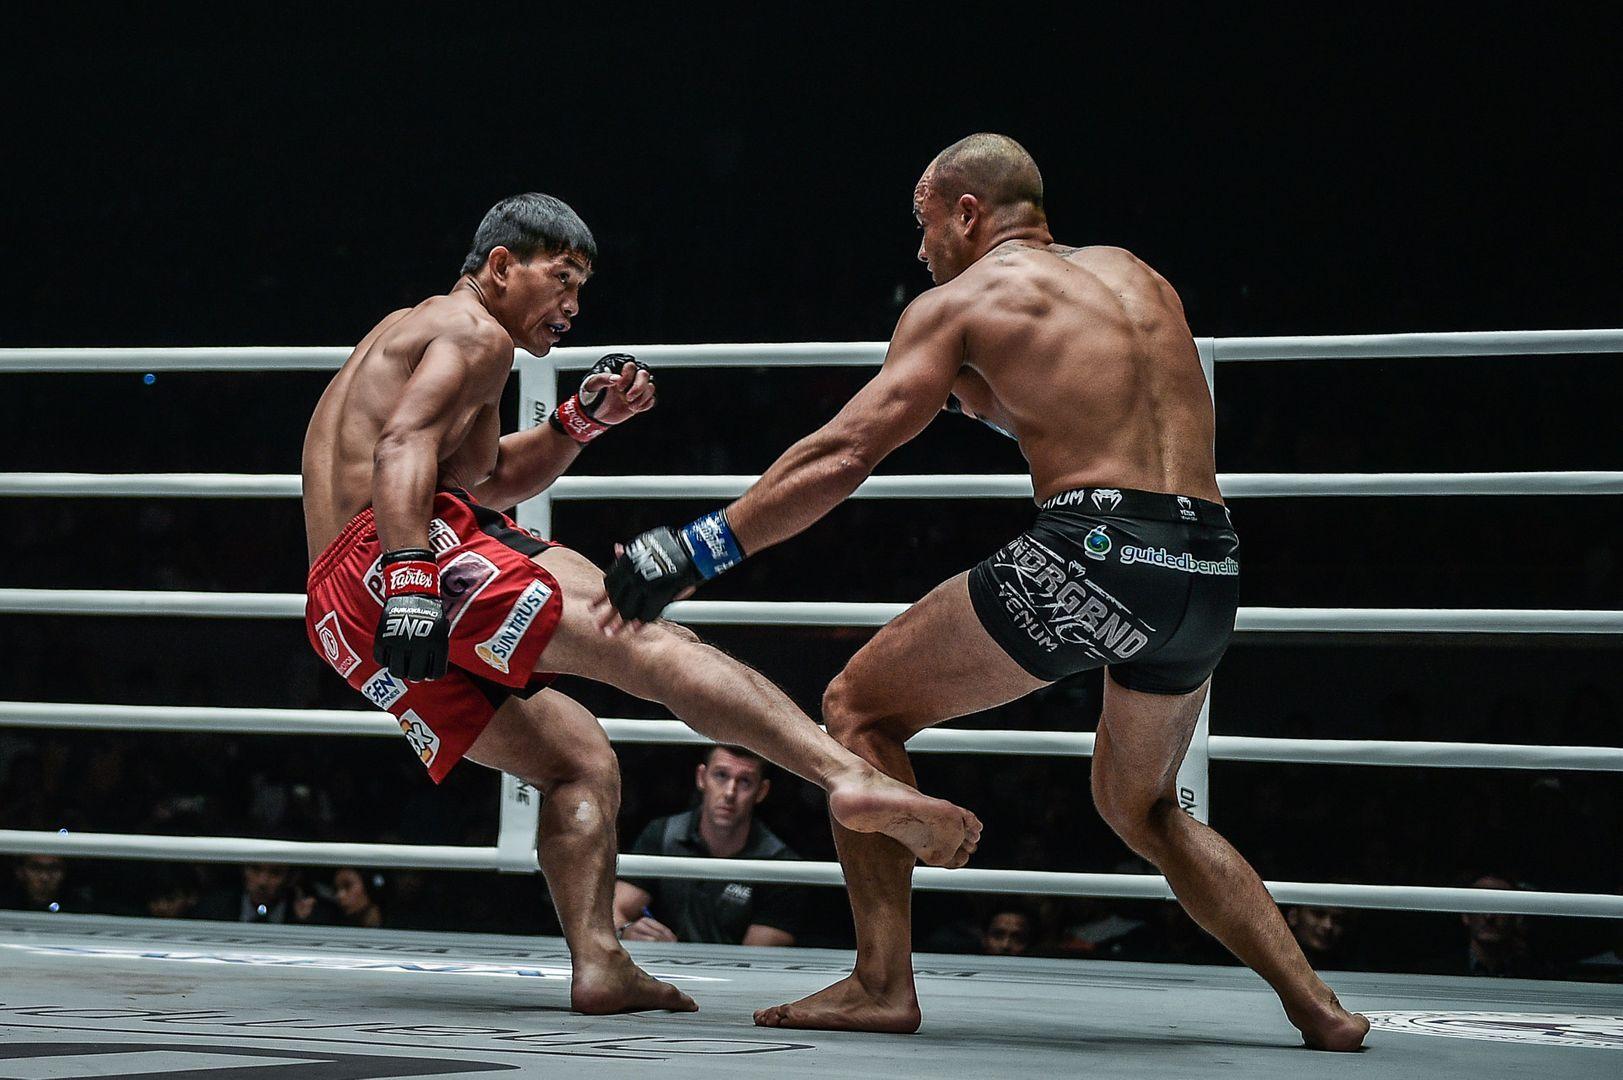 Filipino MMA fighter Eduard Folayang kicks out Eddie Alvarez's leg